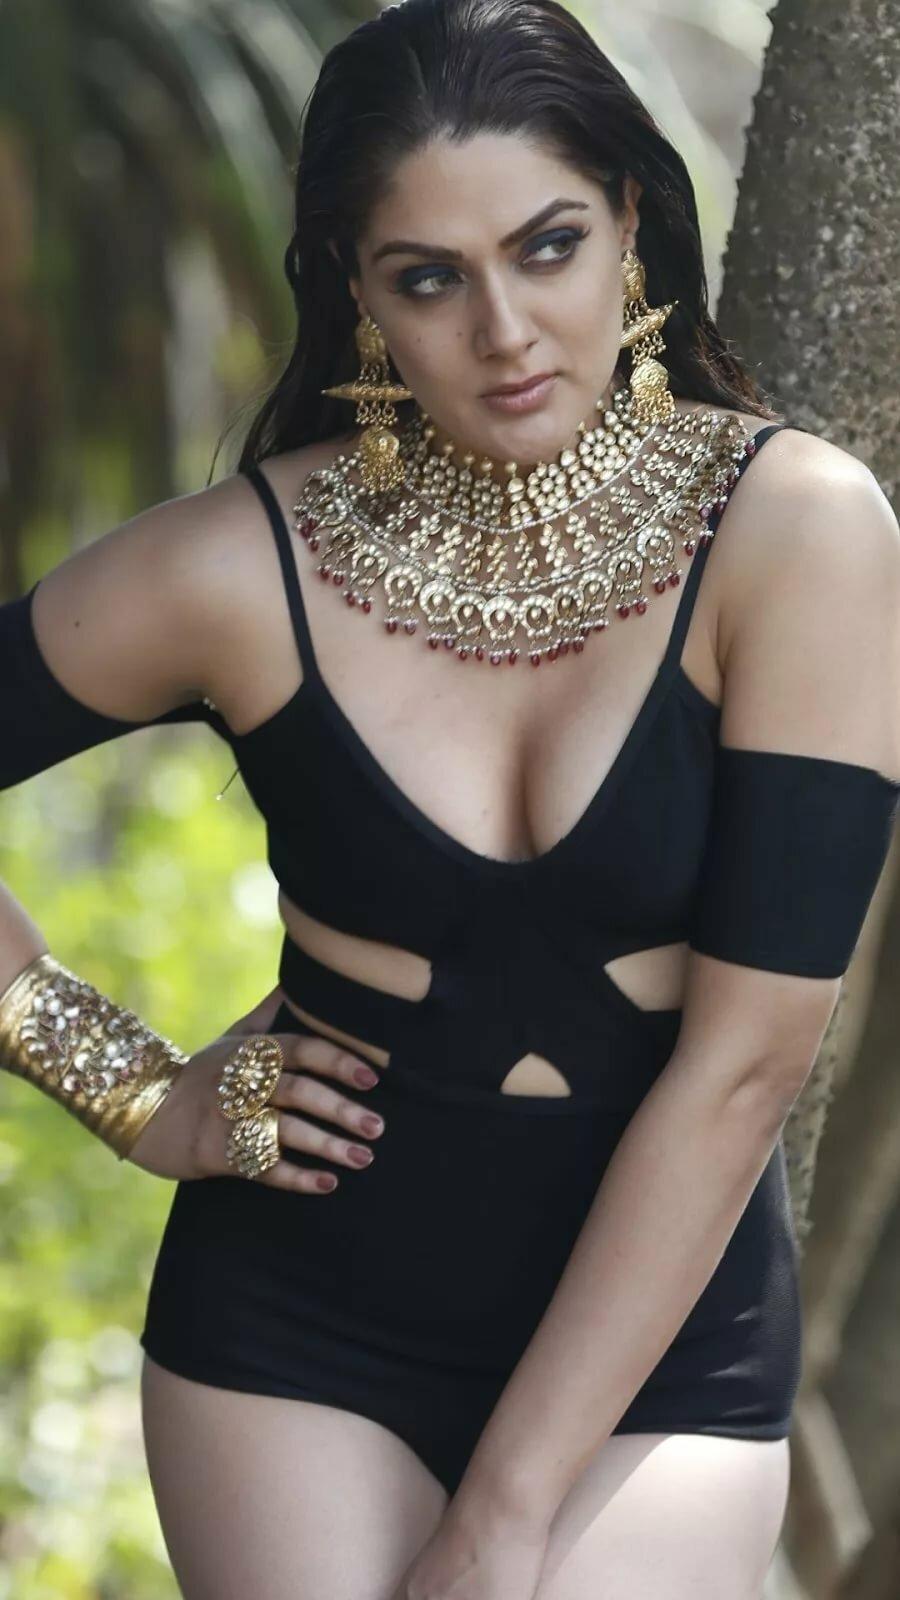 bollywood-actress-in-bikini-amateur-free-live-porn-video